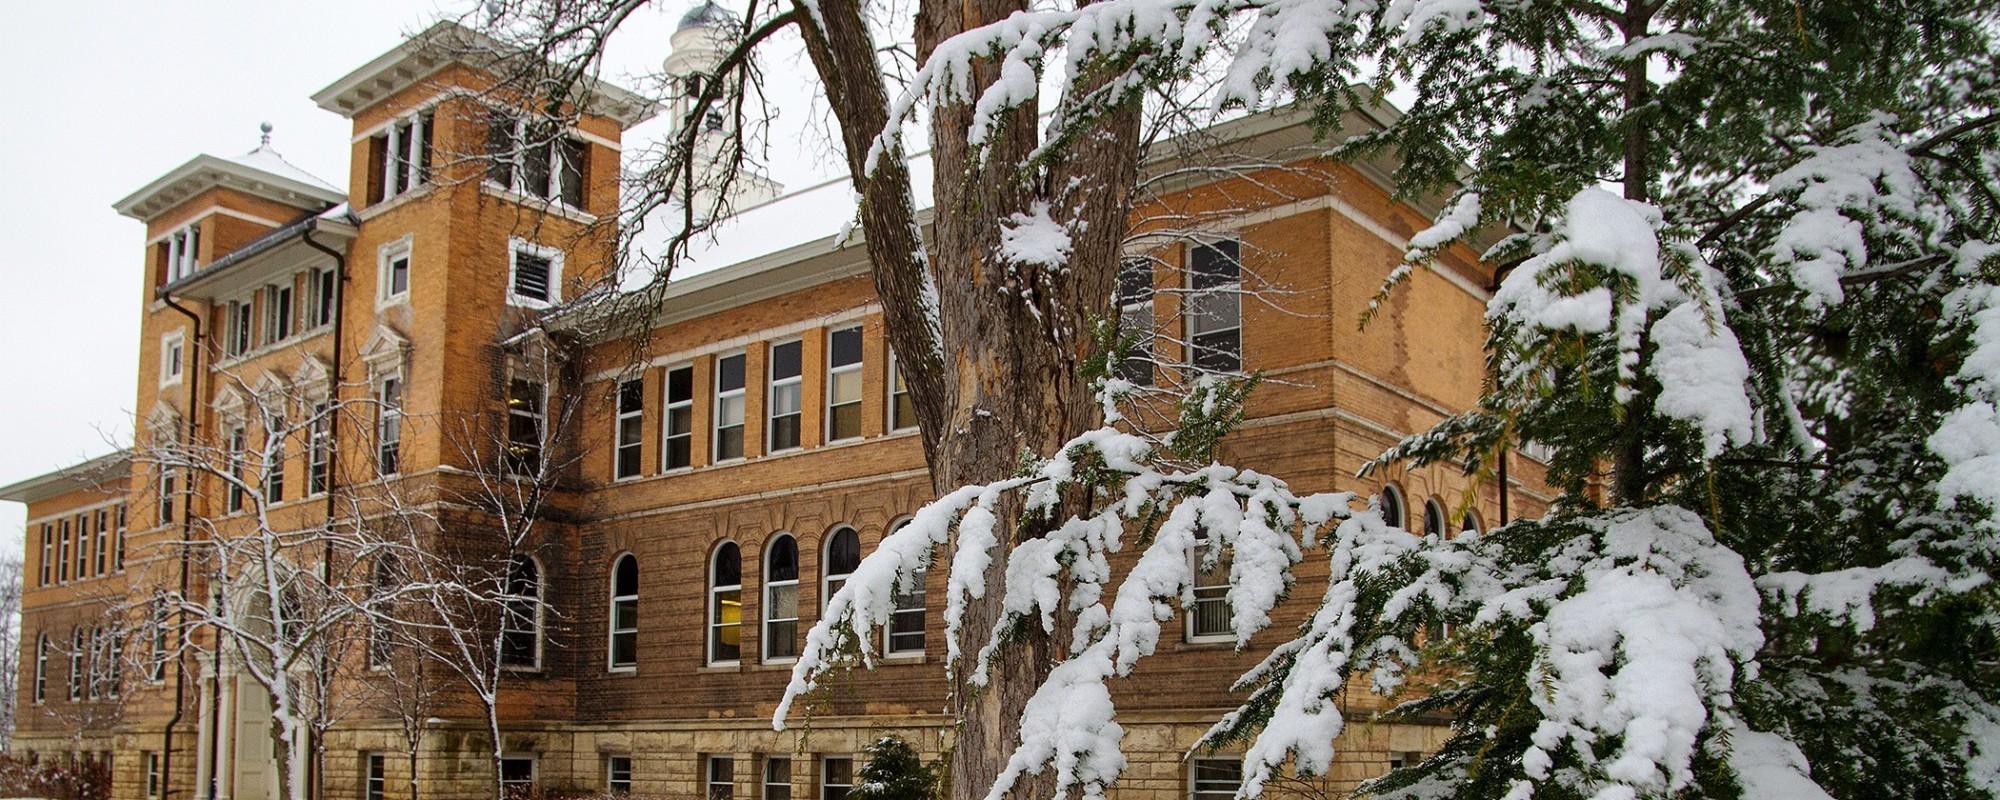 UW-Stevens Point Old Main Hall in winter